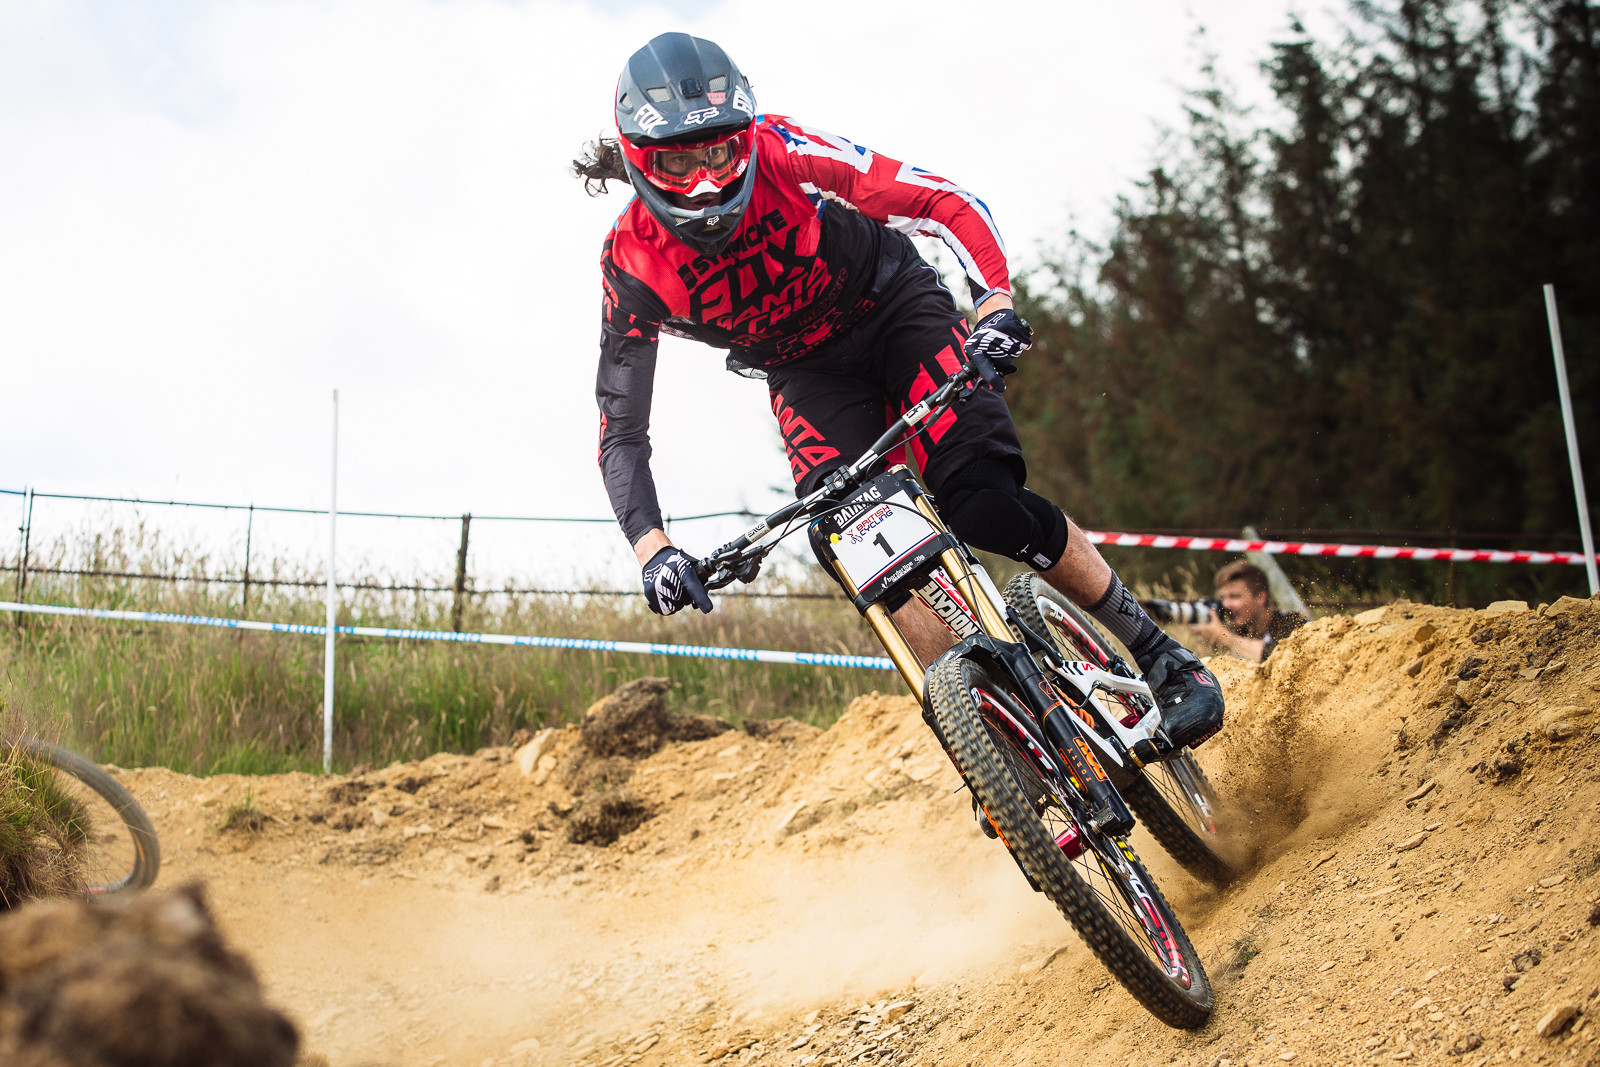 Josh Bryceland - 2015 British National Champs Downhill - 2015 British National Champs Downhill Photos - Mountain Biking Pictures - Vital MTB